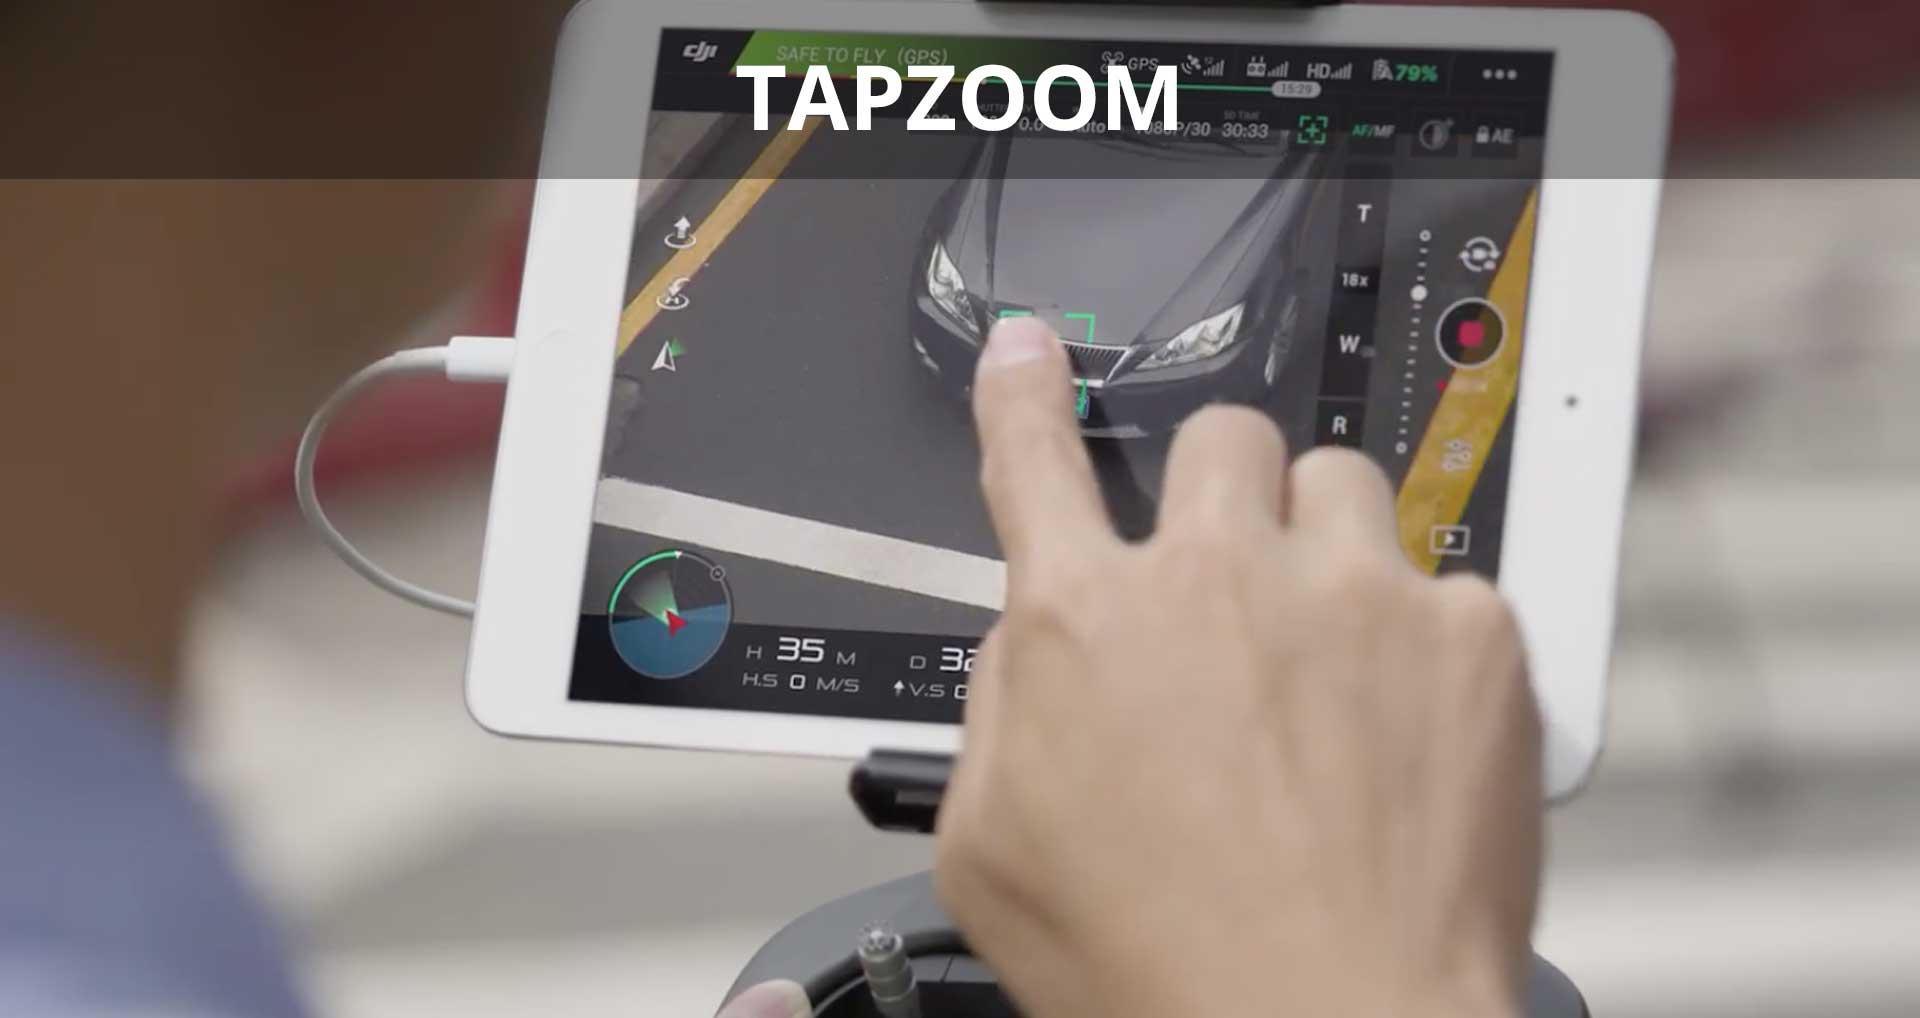 DJI Zenmuse Z30 TapZoom